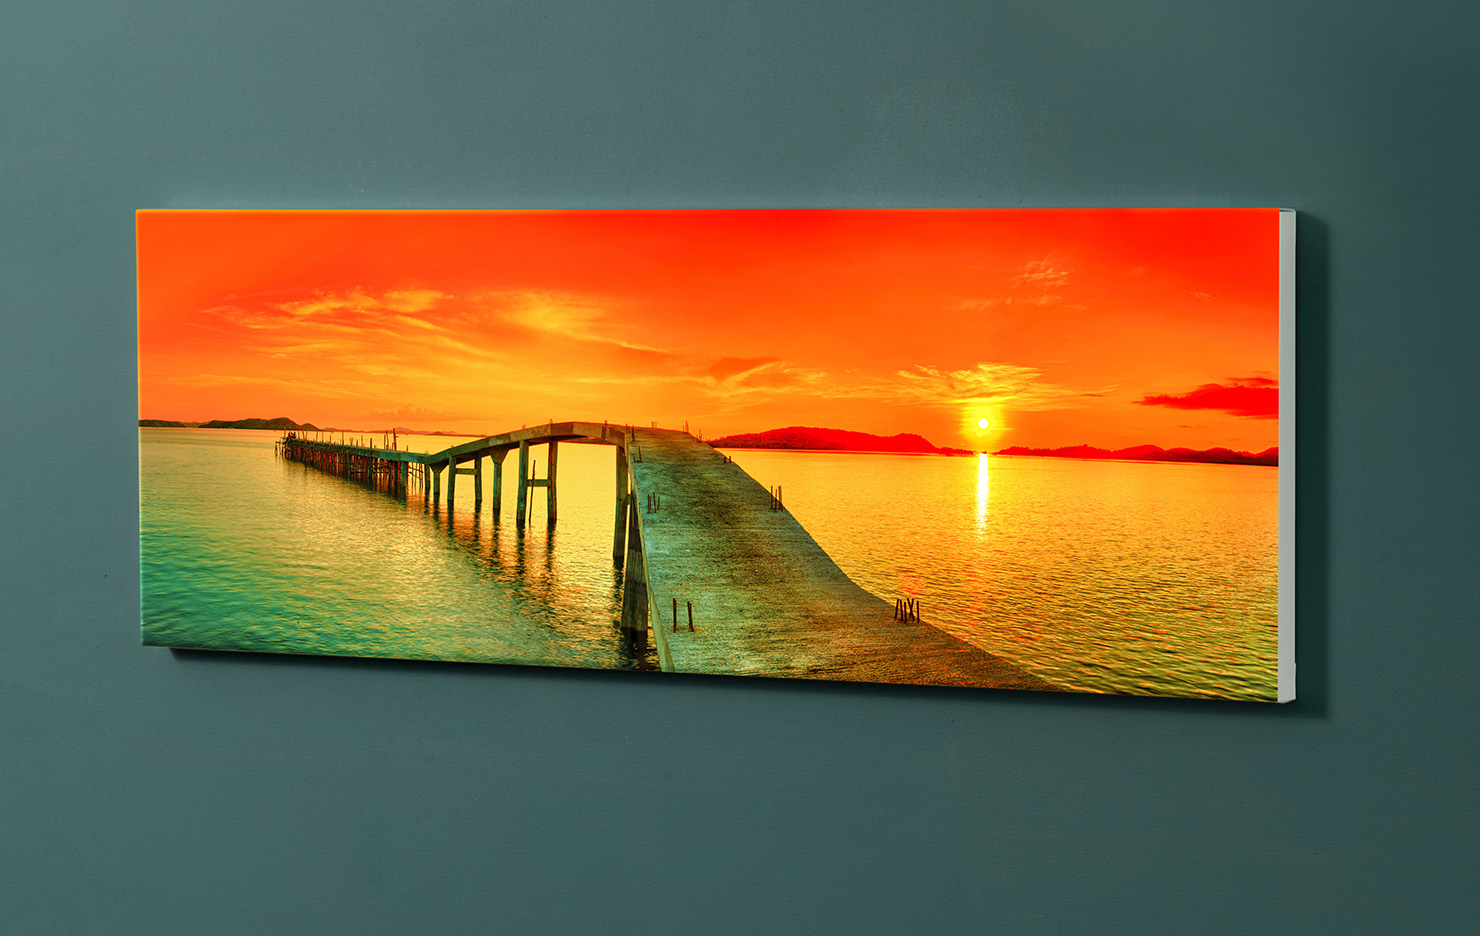 Magnettafel NOTIZ 90x30cm Motiv-Pinnwand M114 Sonnenuntergang